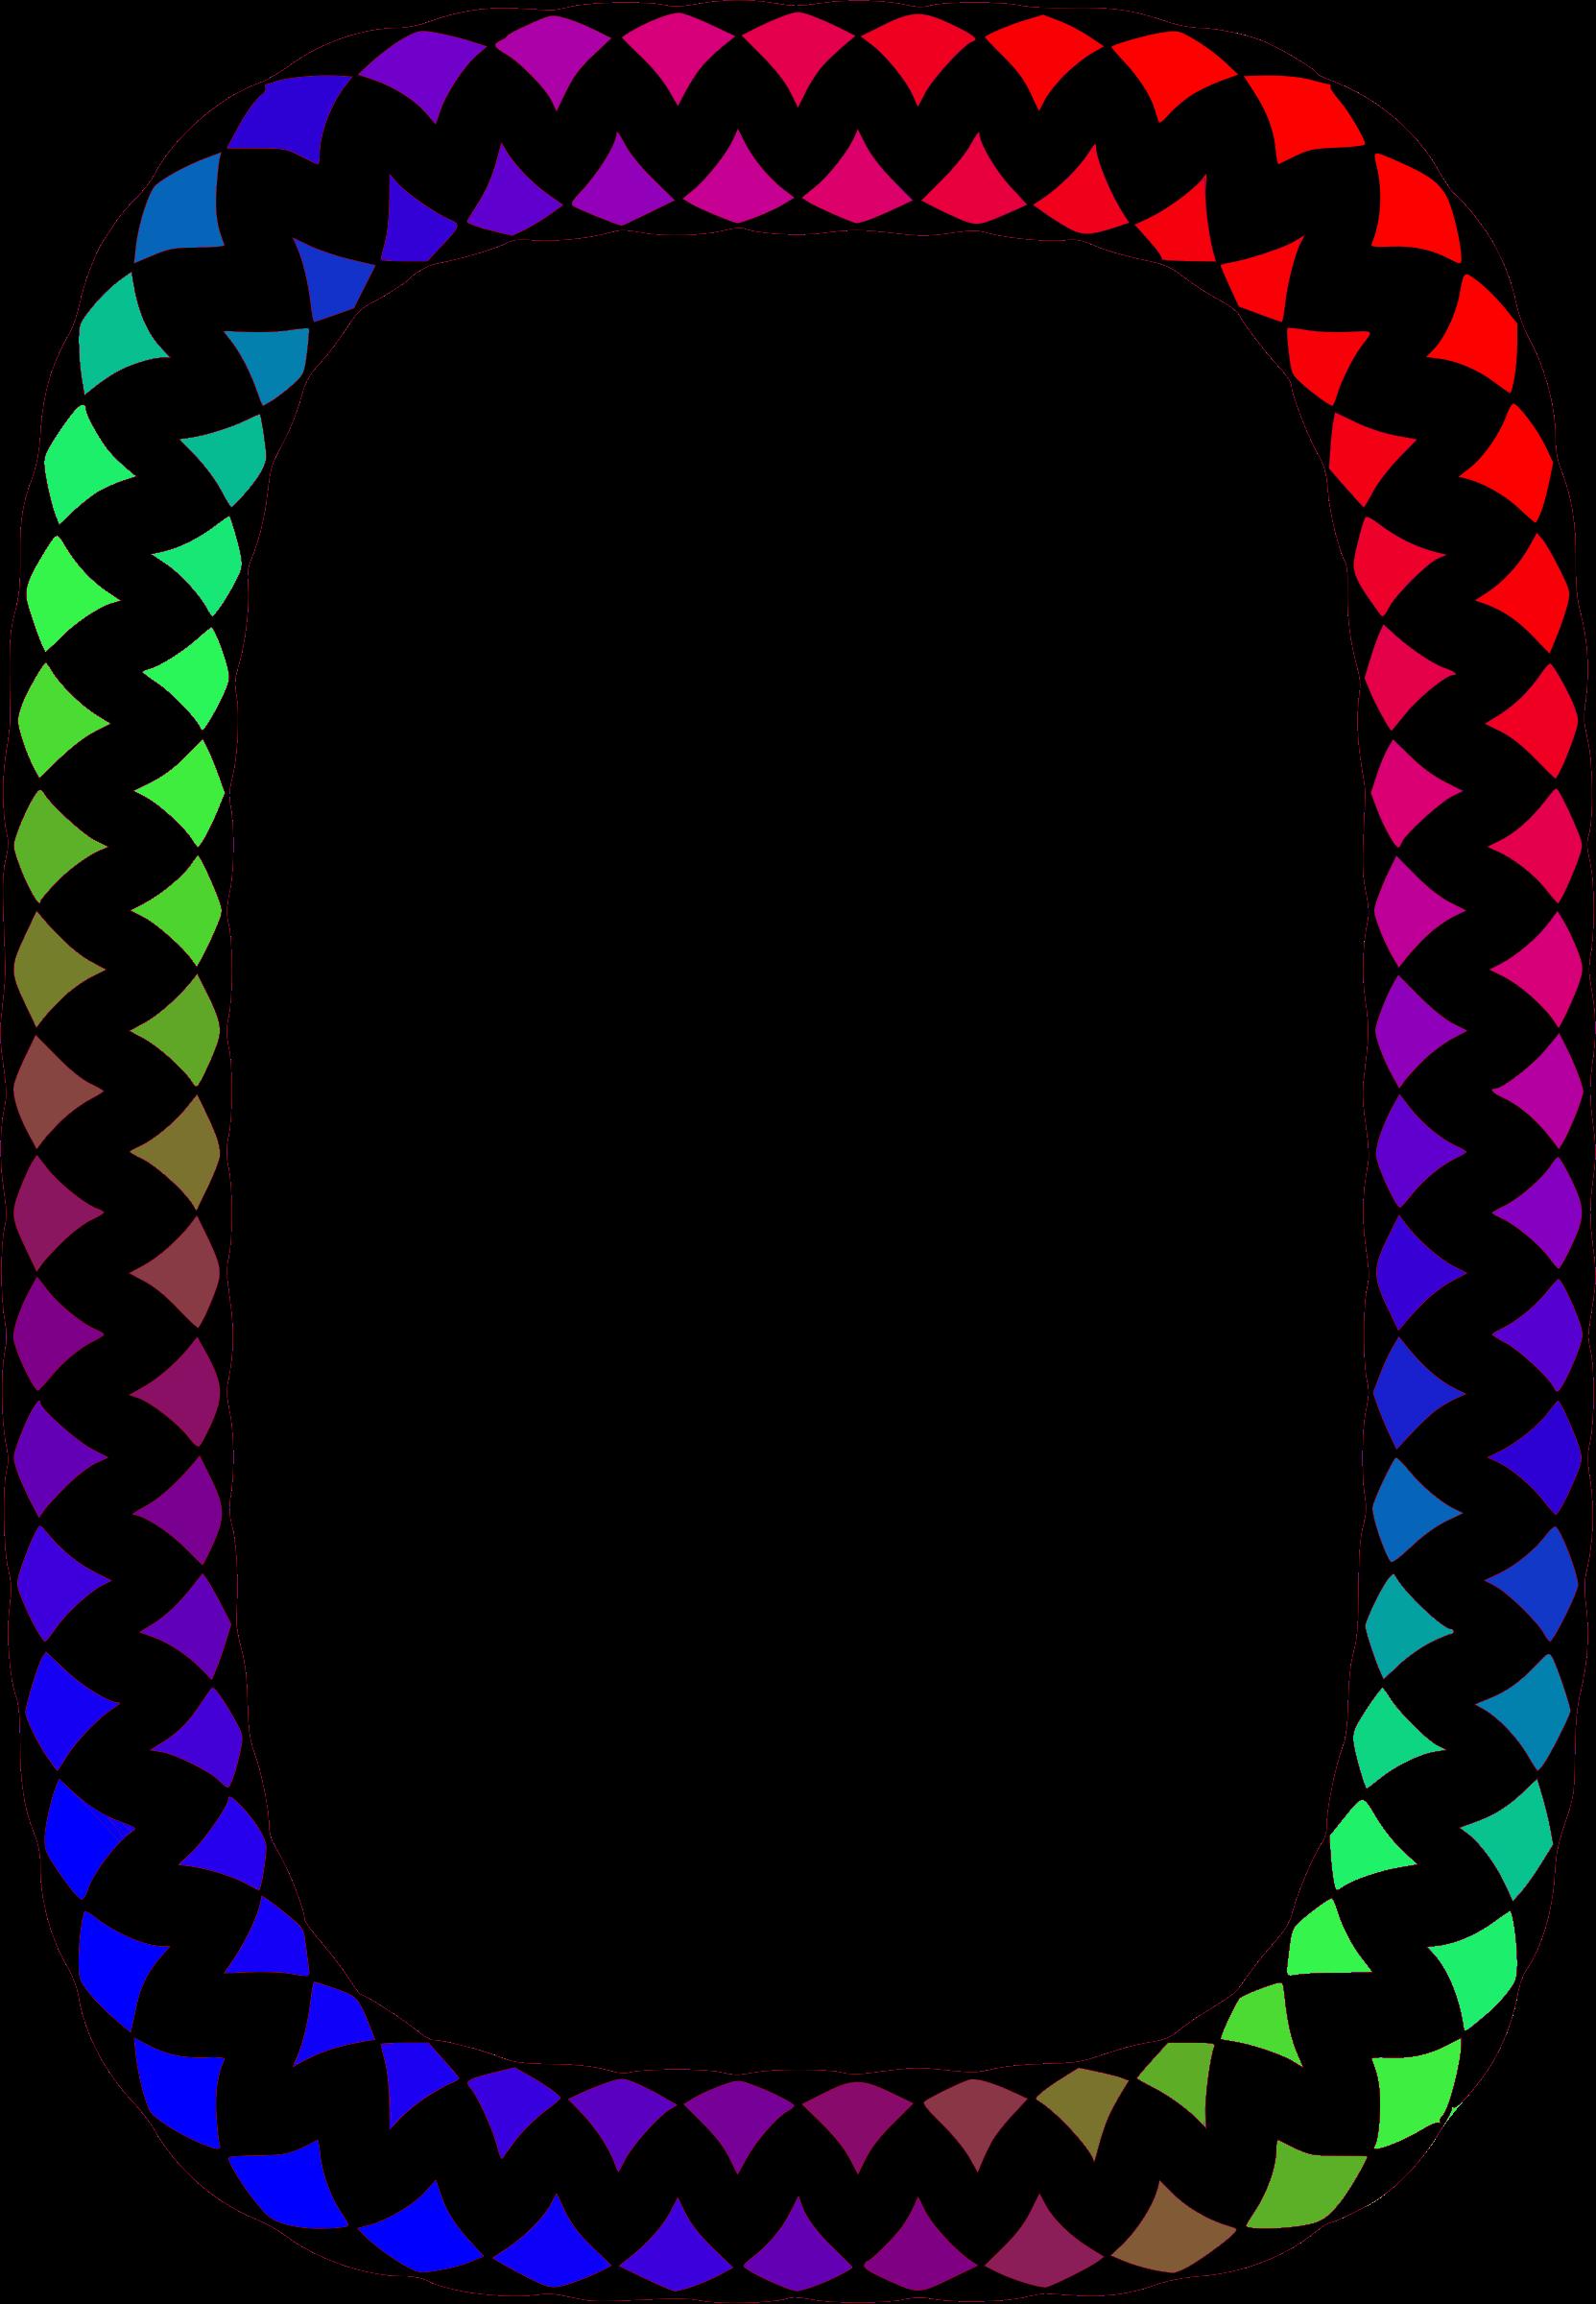 jpg free library Big image png. Rectangular frame clipart